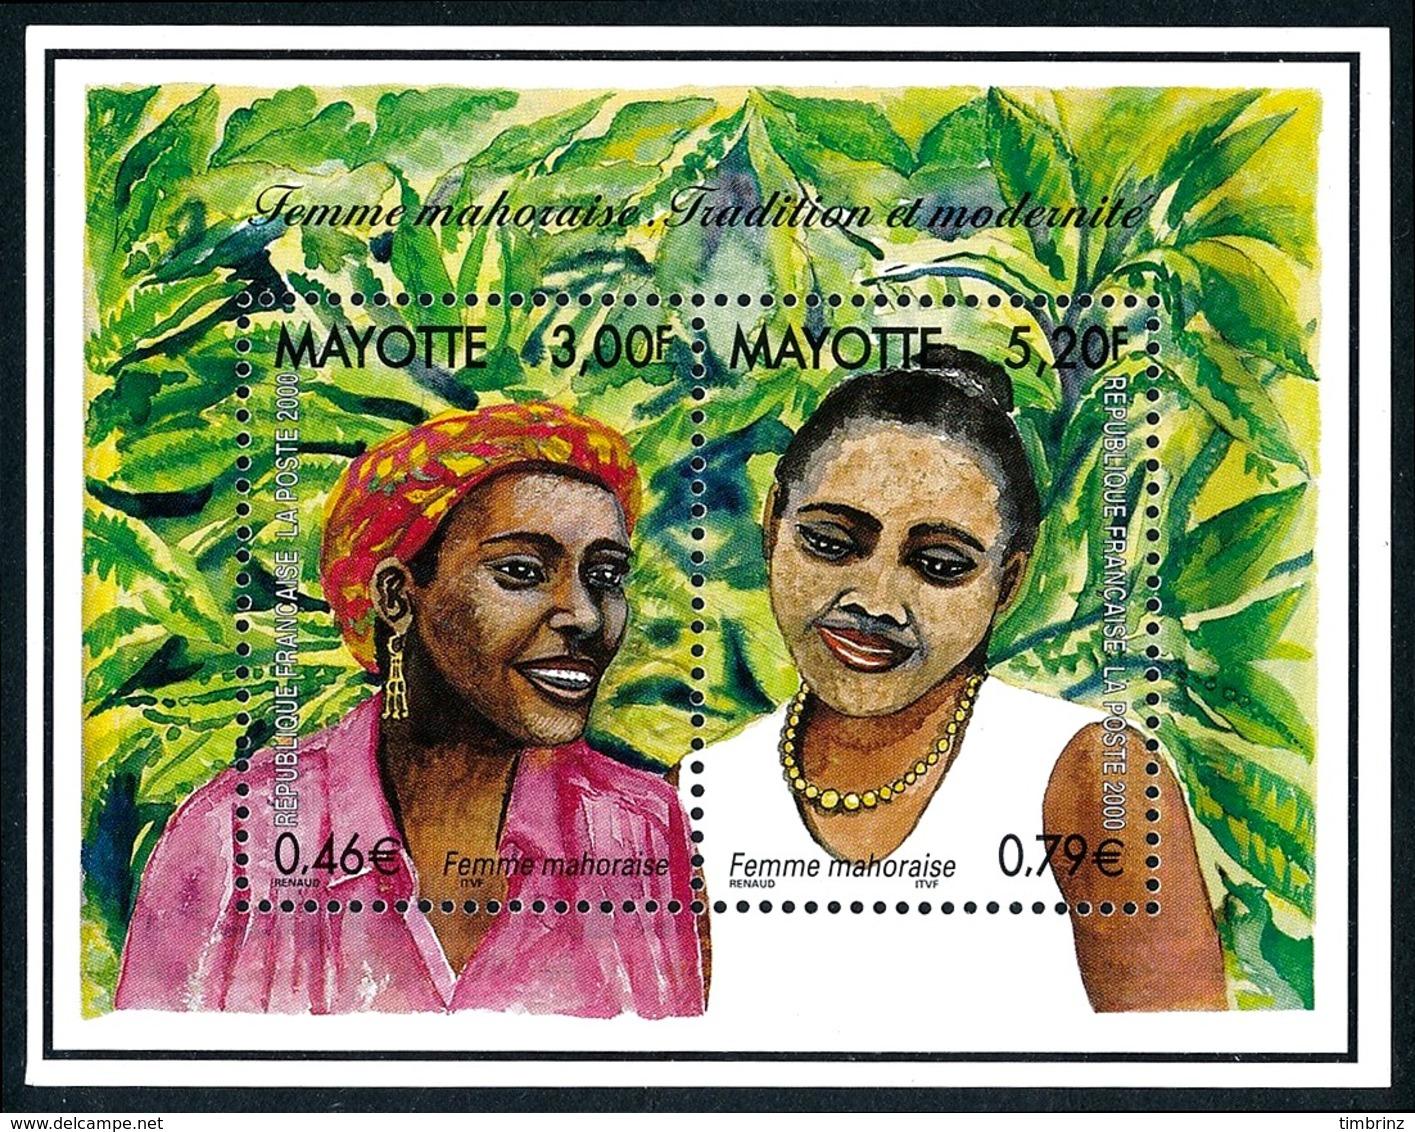 MAYOTTE 2000 - Yv. 85 Et 86 = BF3 **   Faciale= 1,25 EUR - Femme Mahoraise (2 Val.)  ..Réf.AFA23331 - Mayotte (1892-2011)